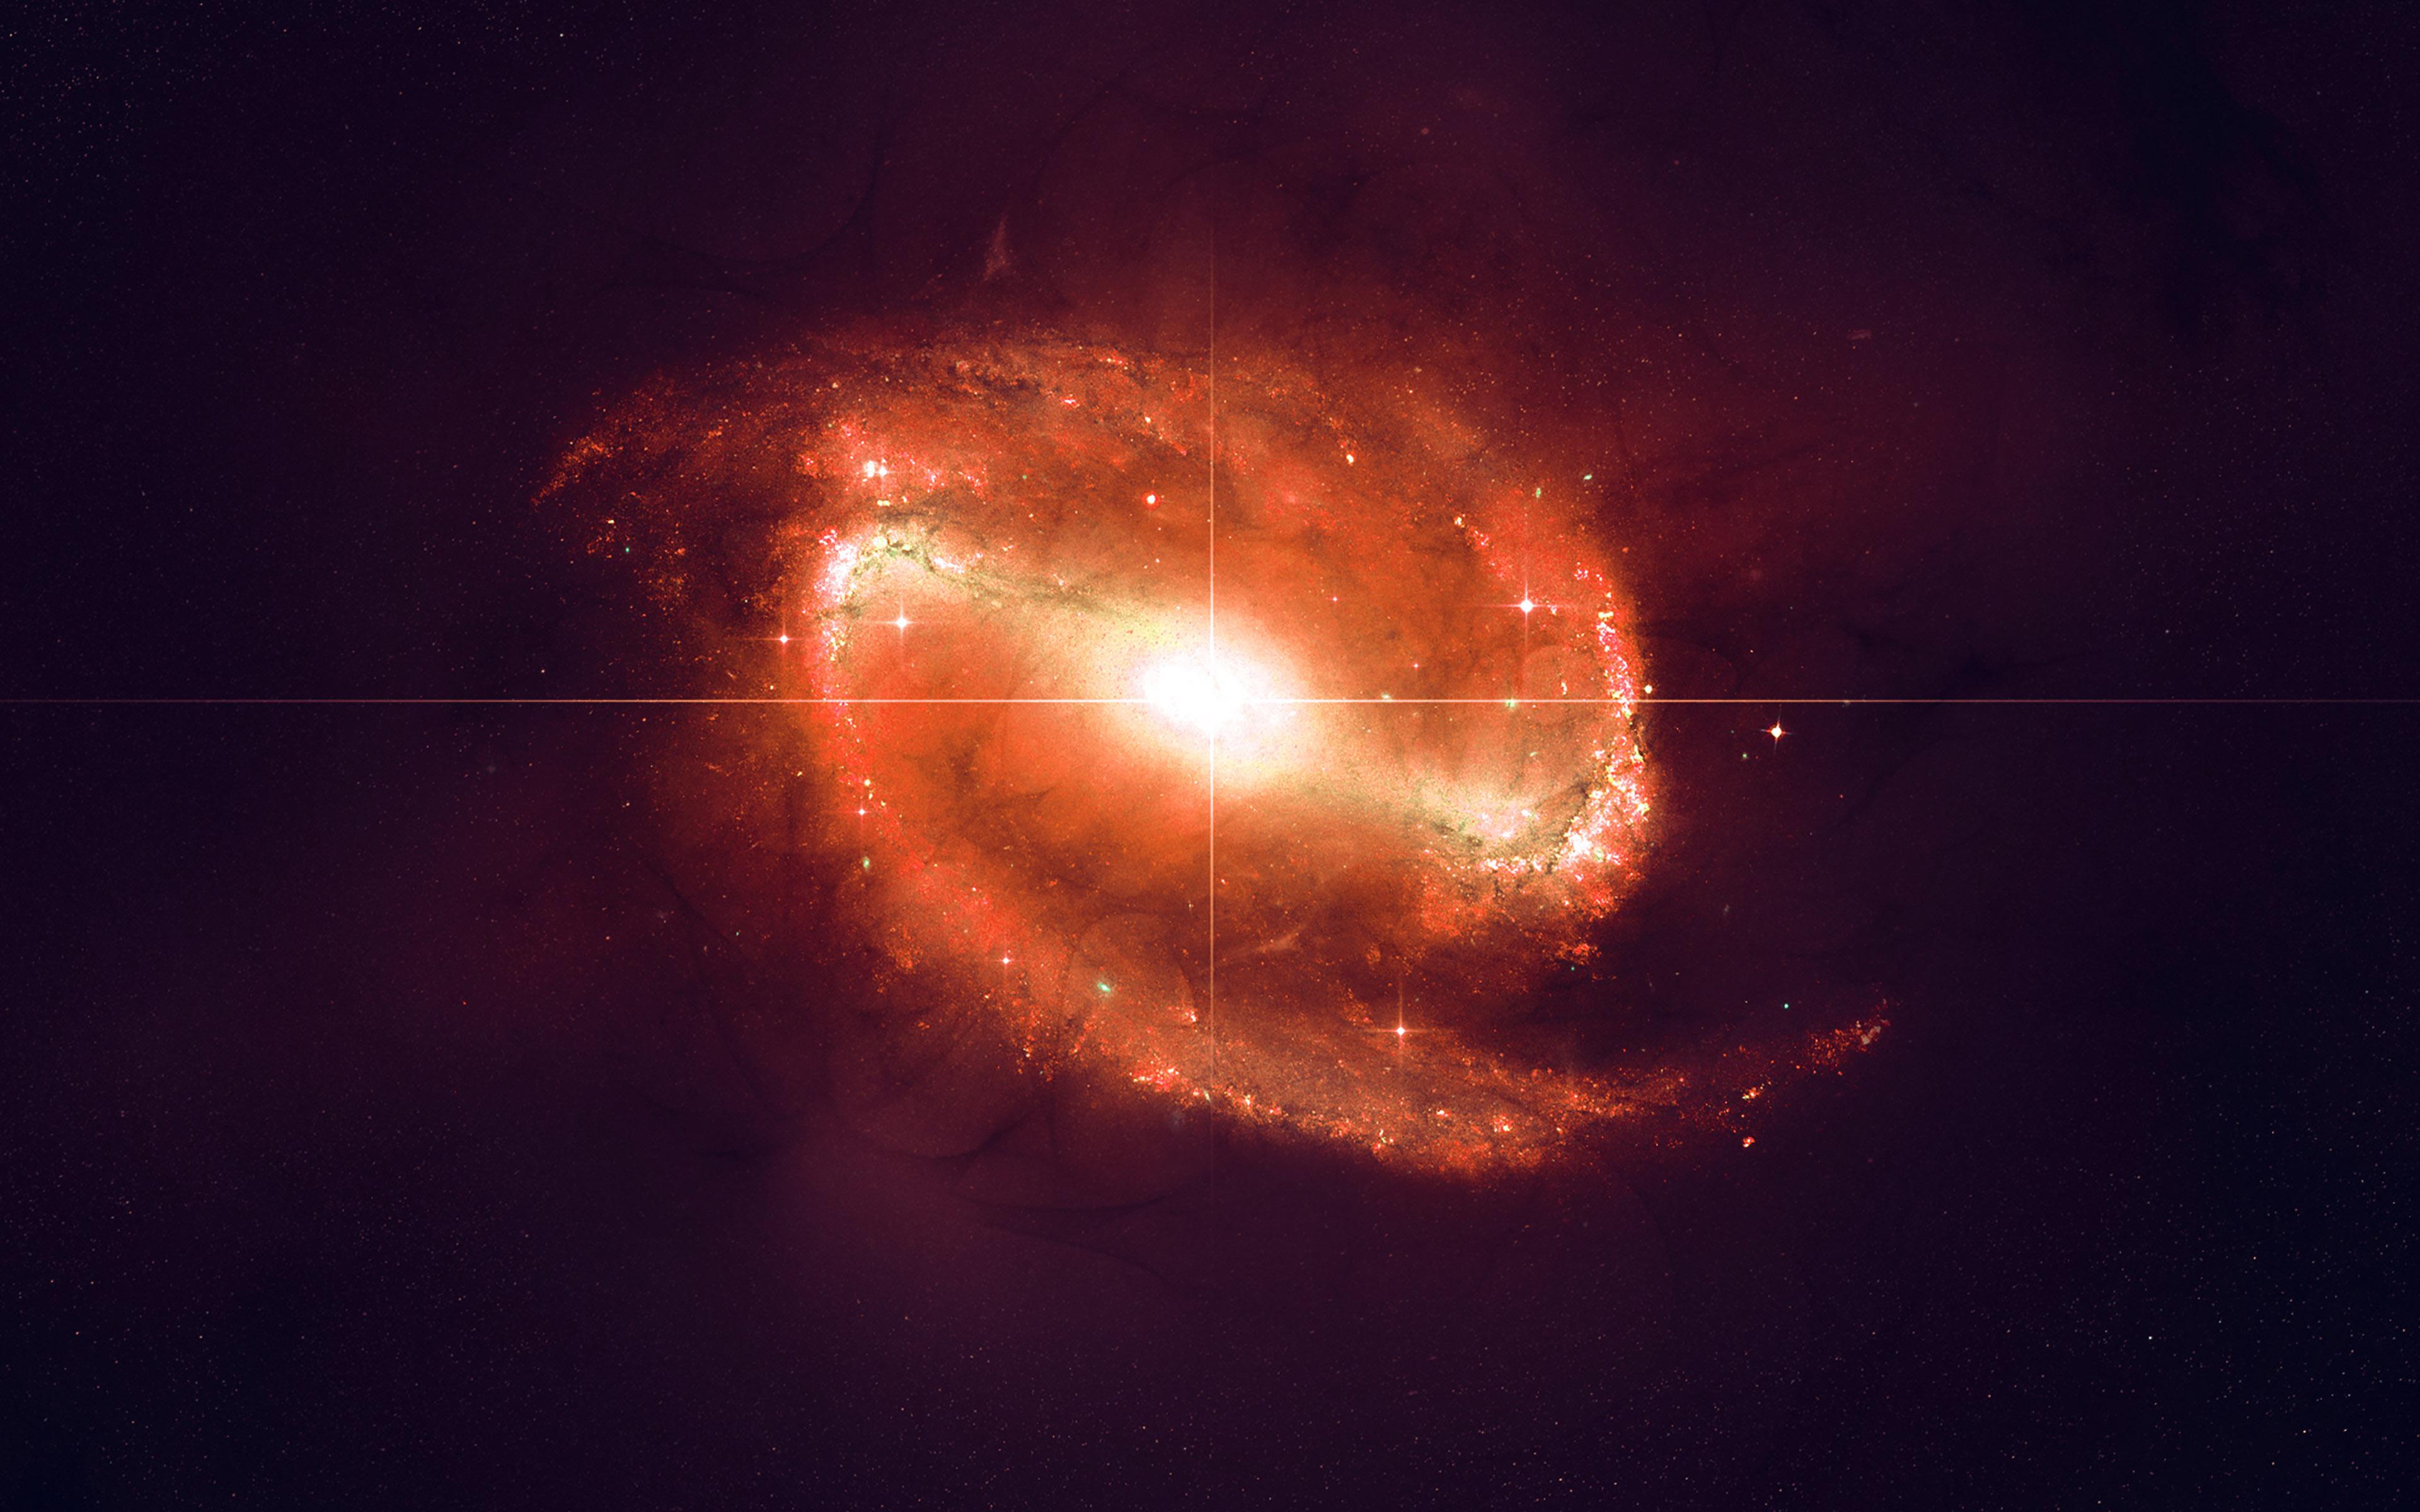 Ml70 Space Red Bingbang Explosion Star Nature Dark Wallpaper